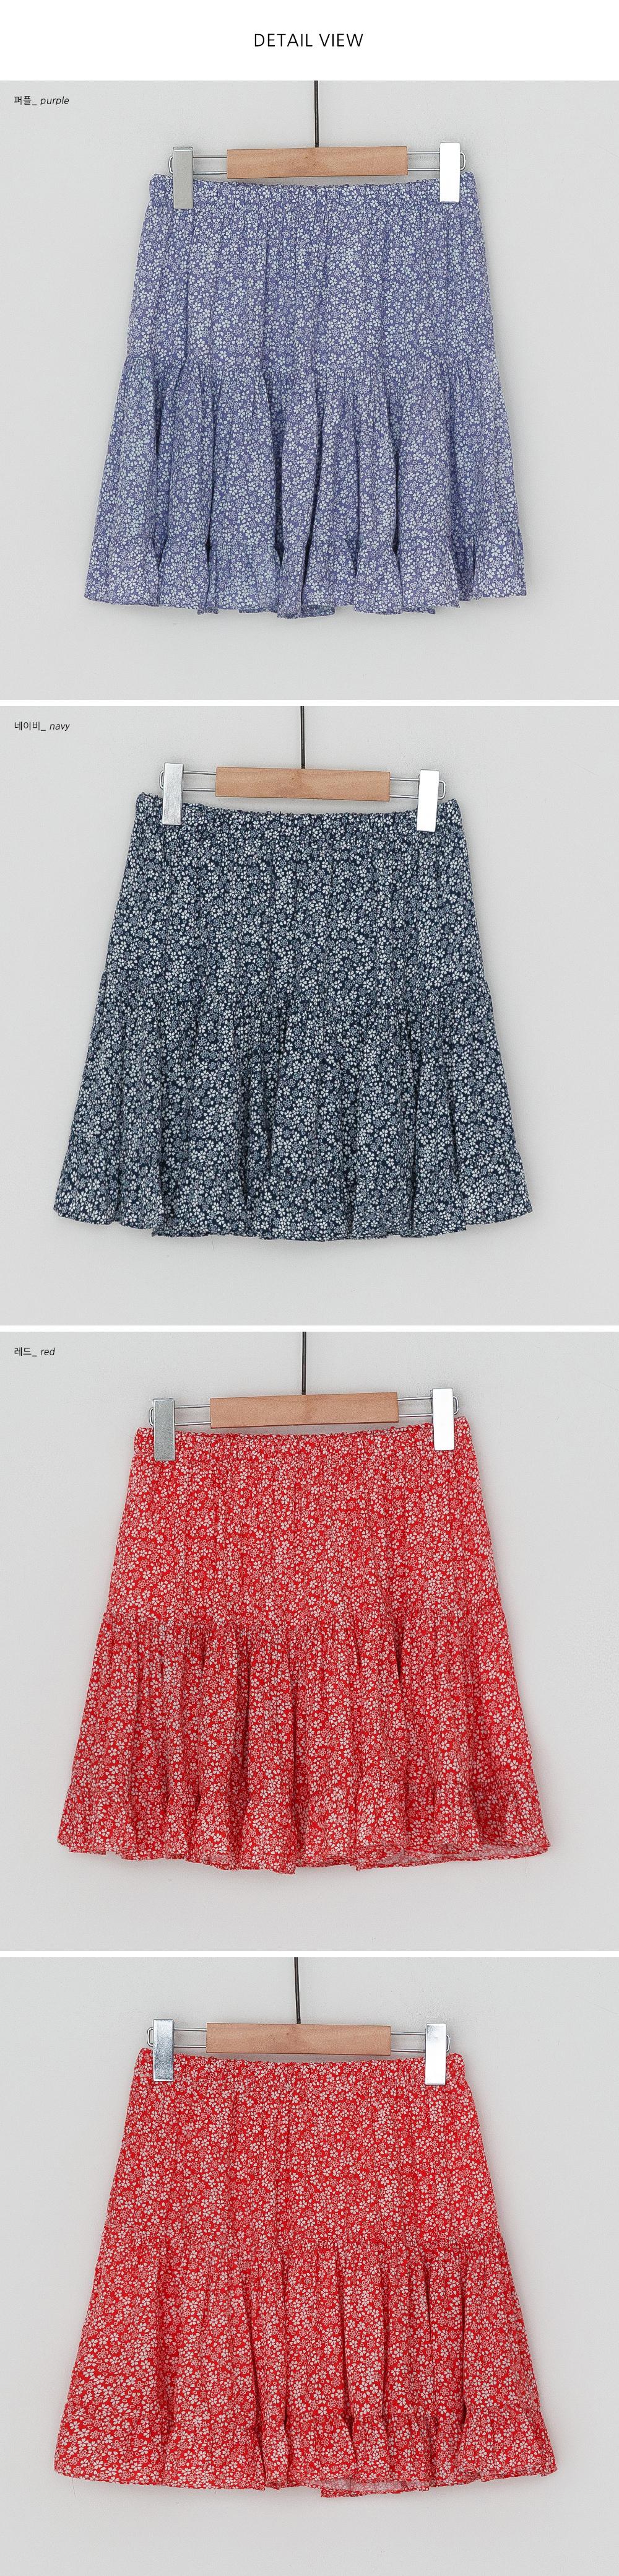 Flower rayon banding mini skirt